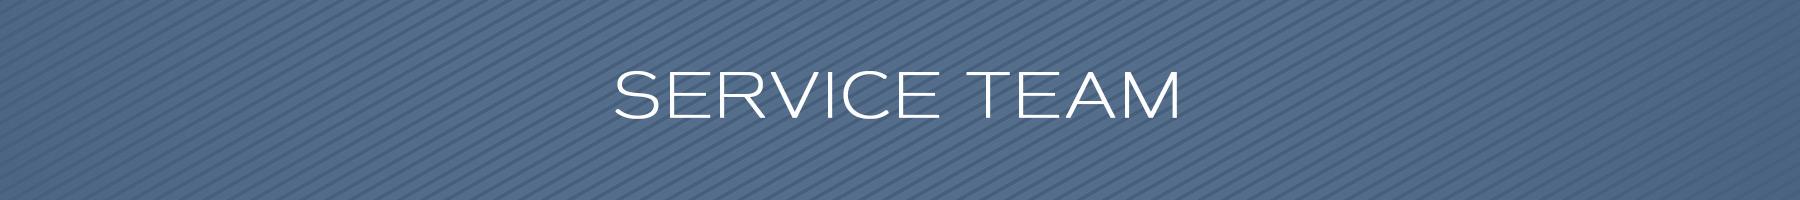 headers_sentinel service team.jpg